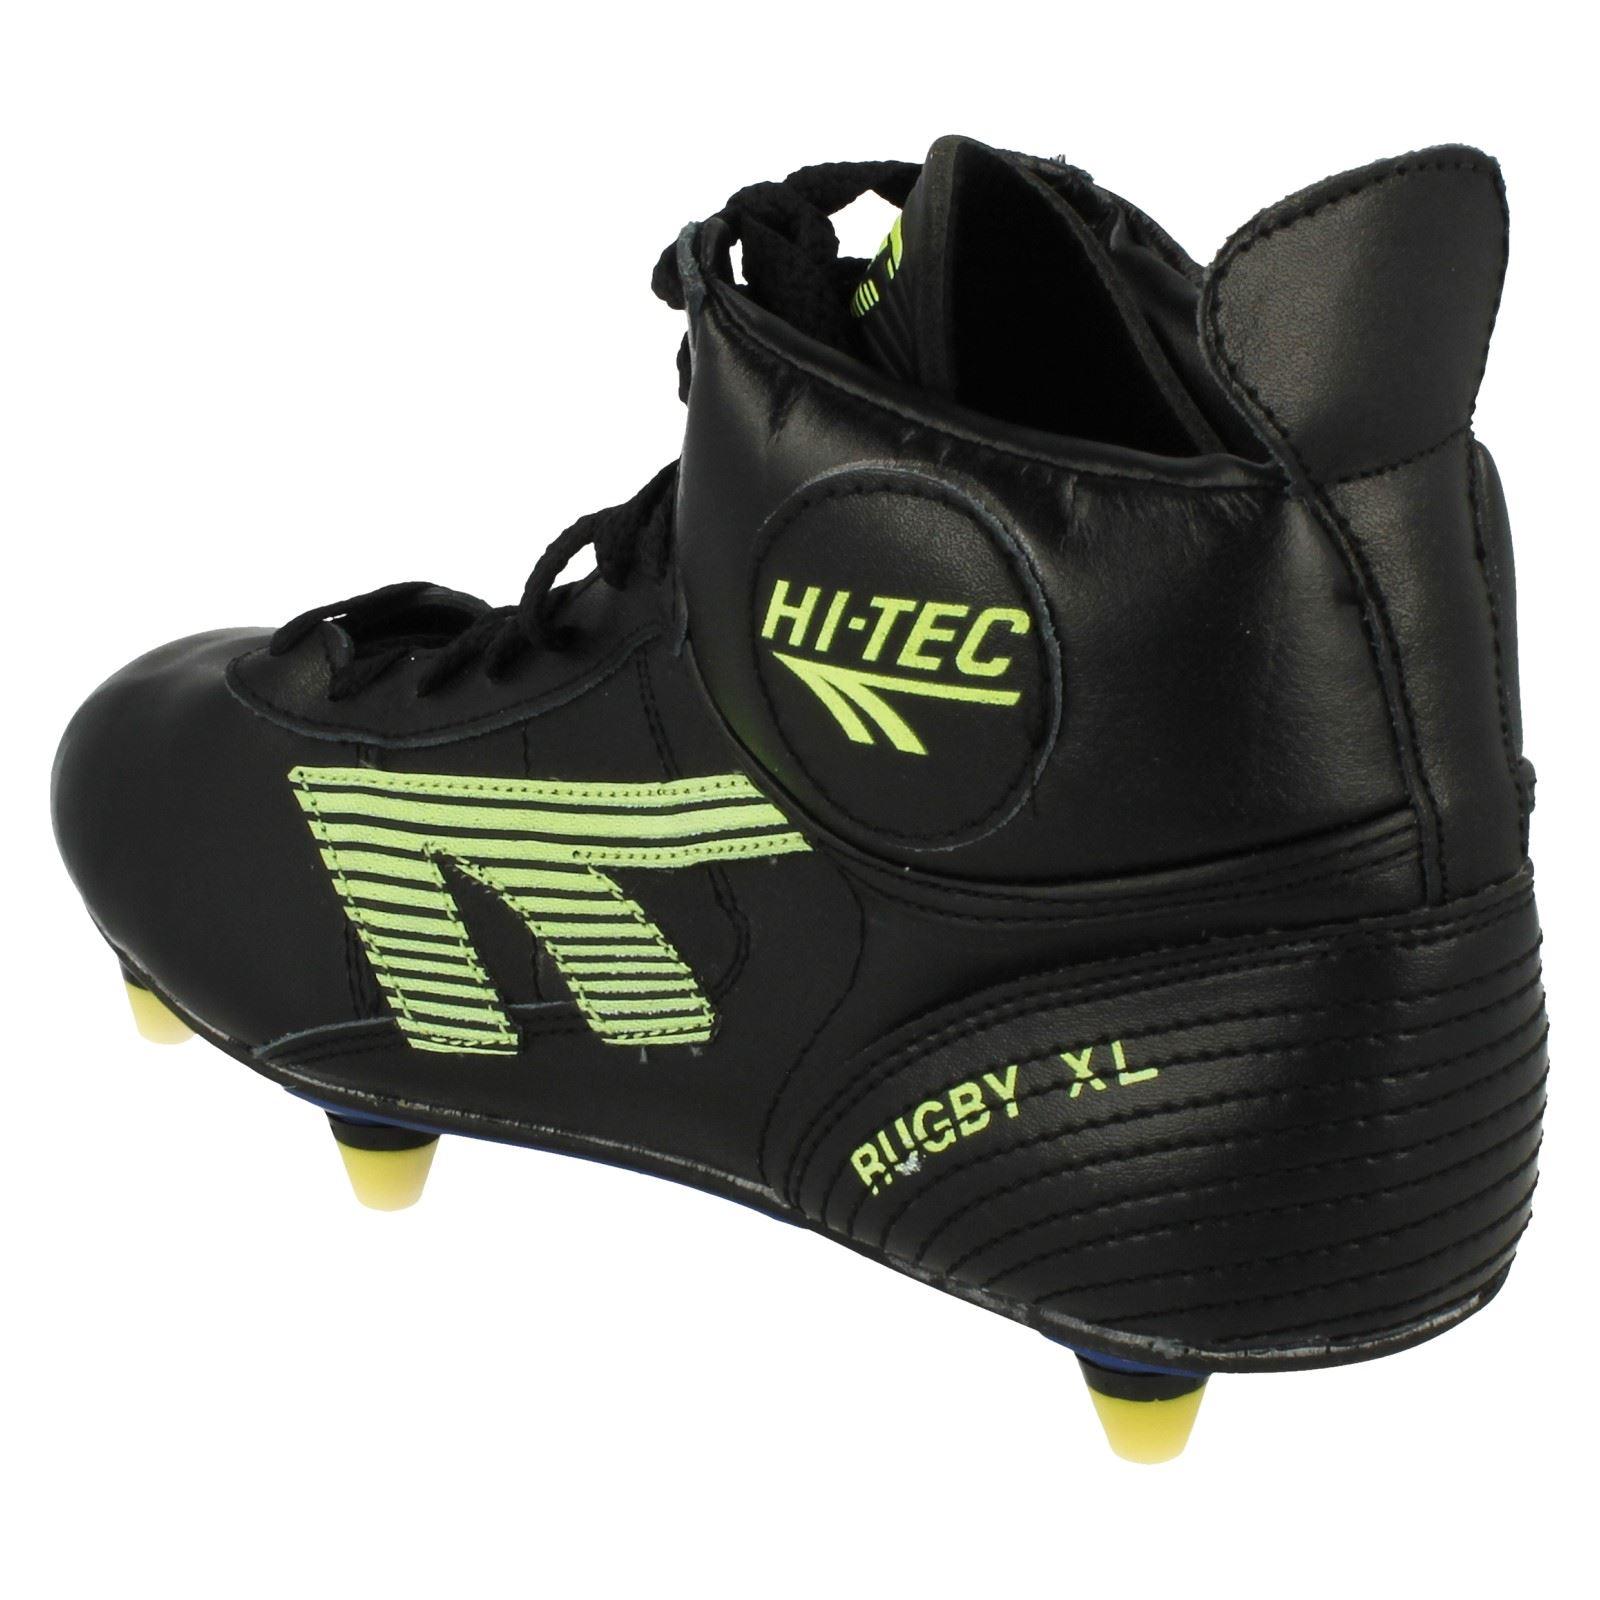 dd3181002a9b Hi-Tec-Mens-Rugby-Boots-Rugby-XL thumbnail 4